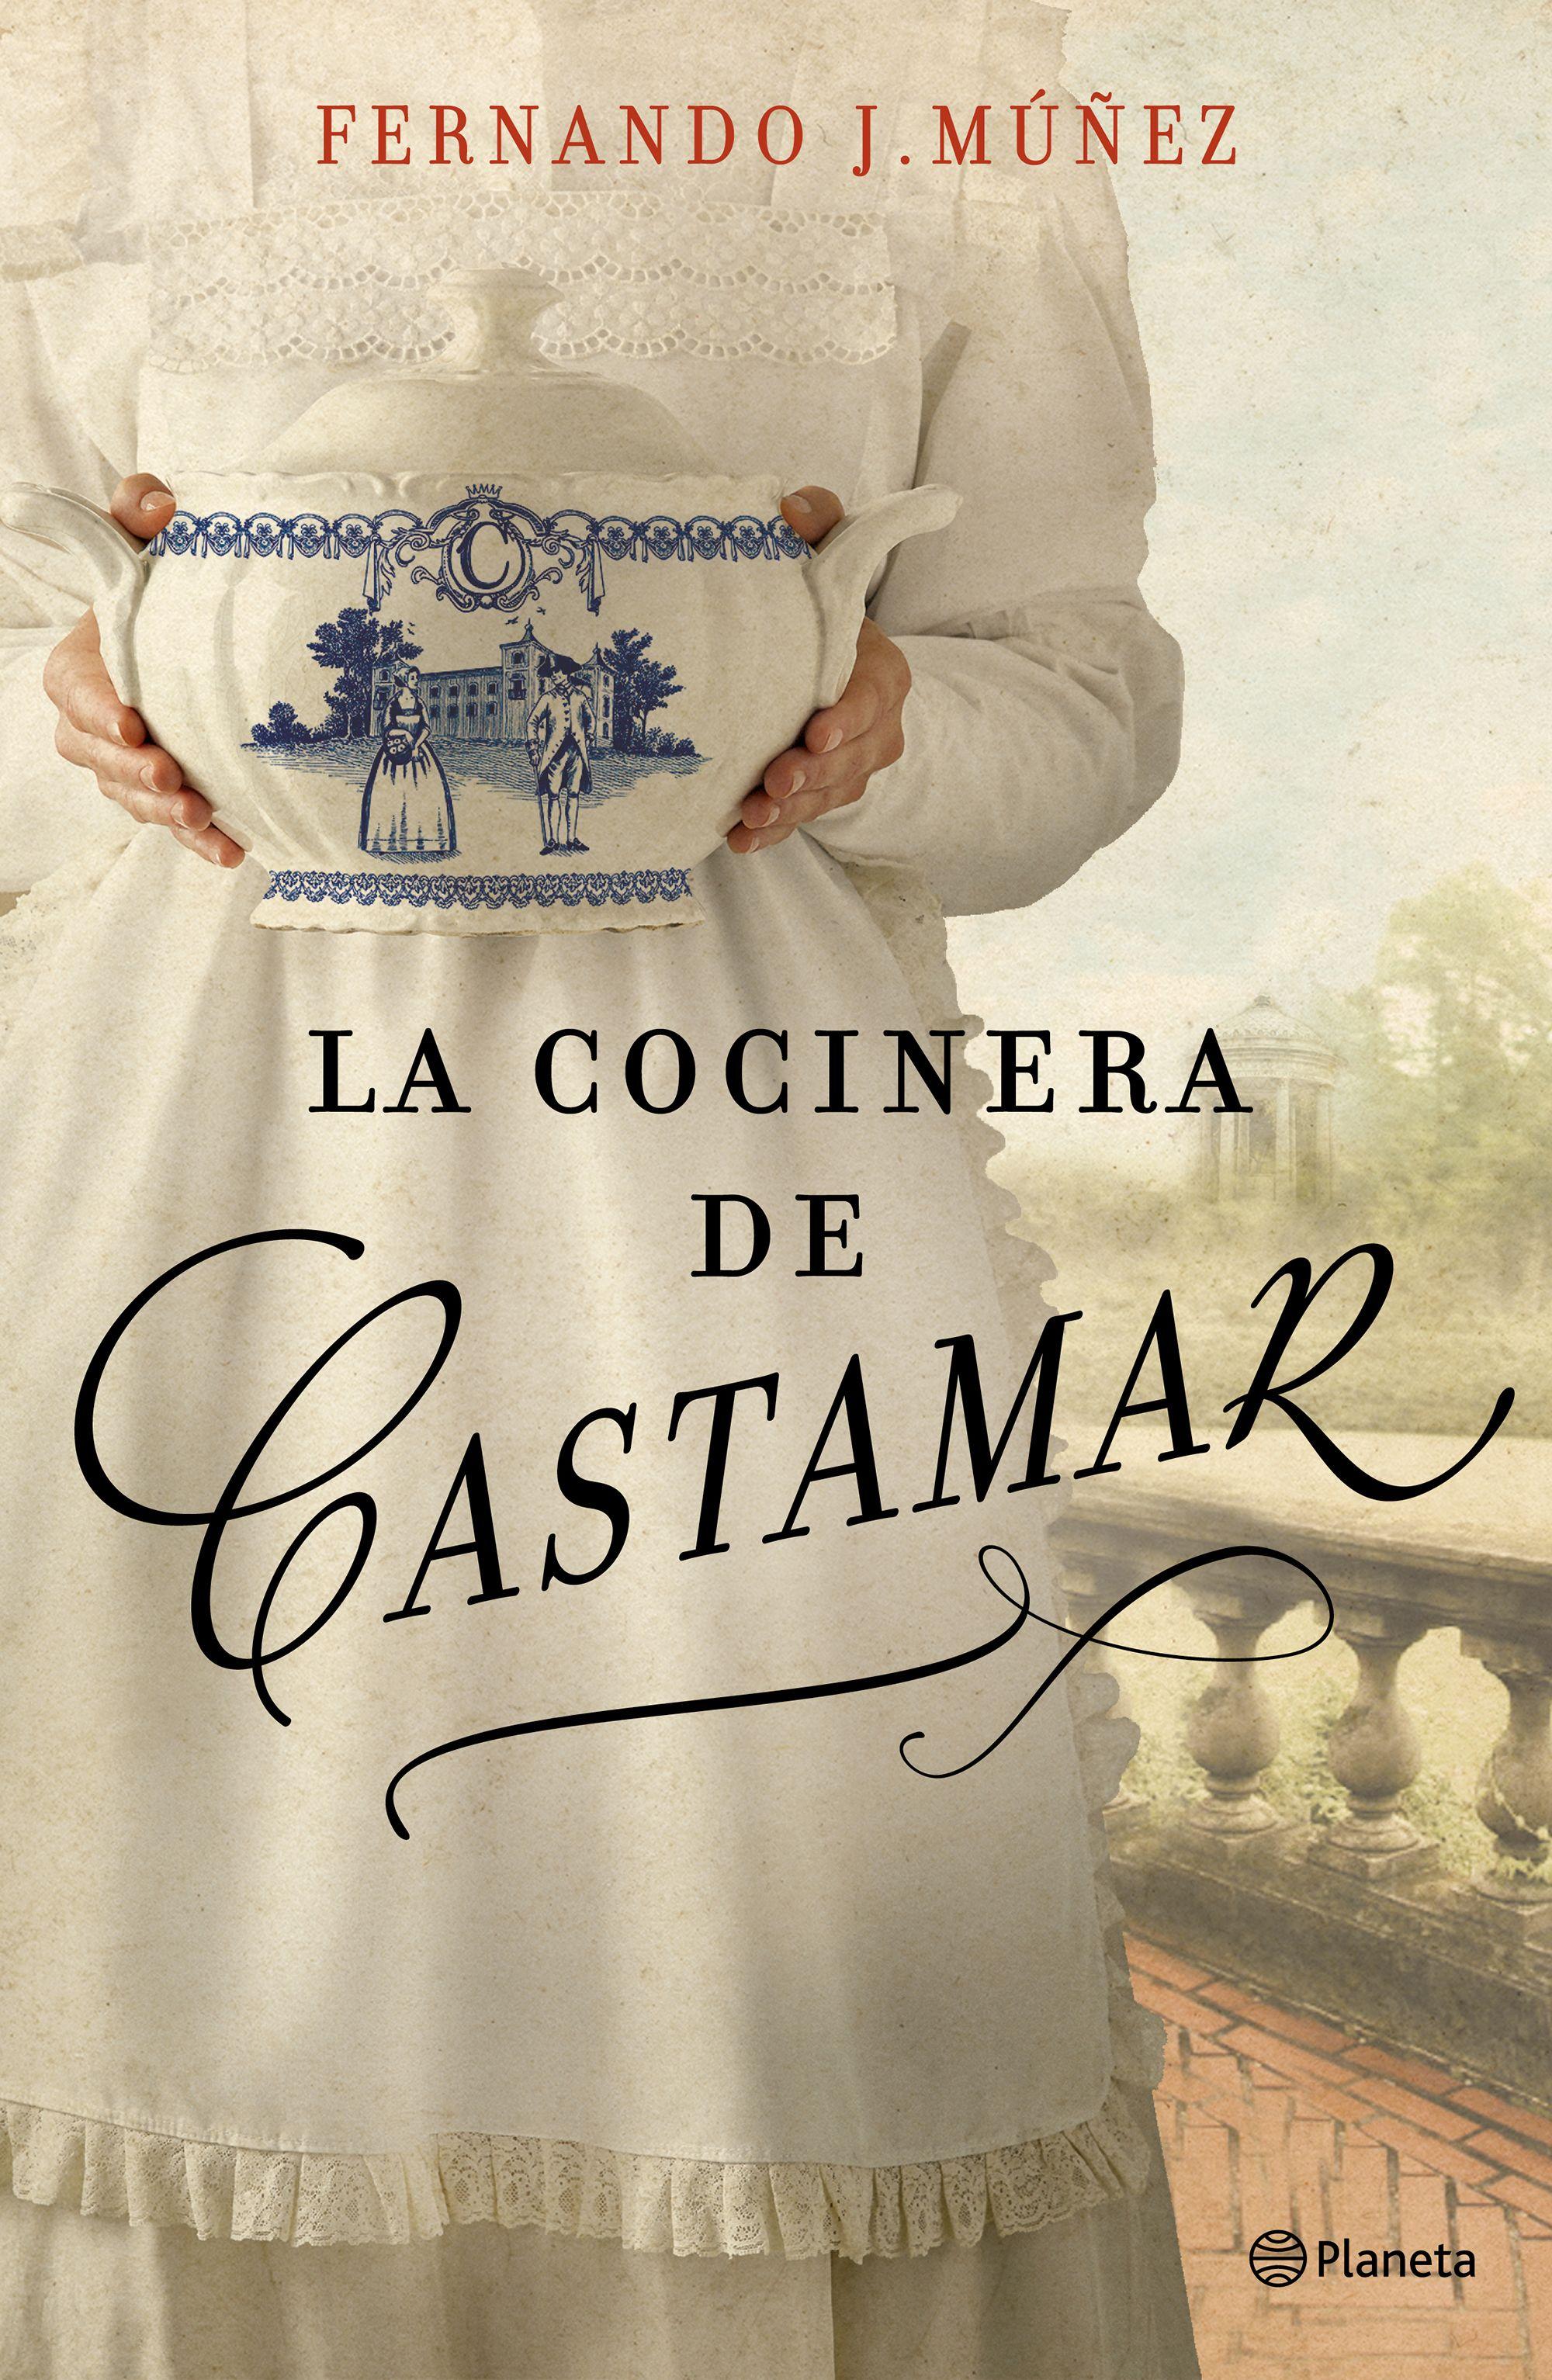 La cocinera de Castamar (Fernando J. Múñez, 2019)